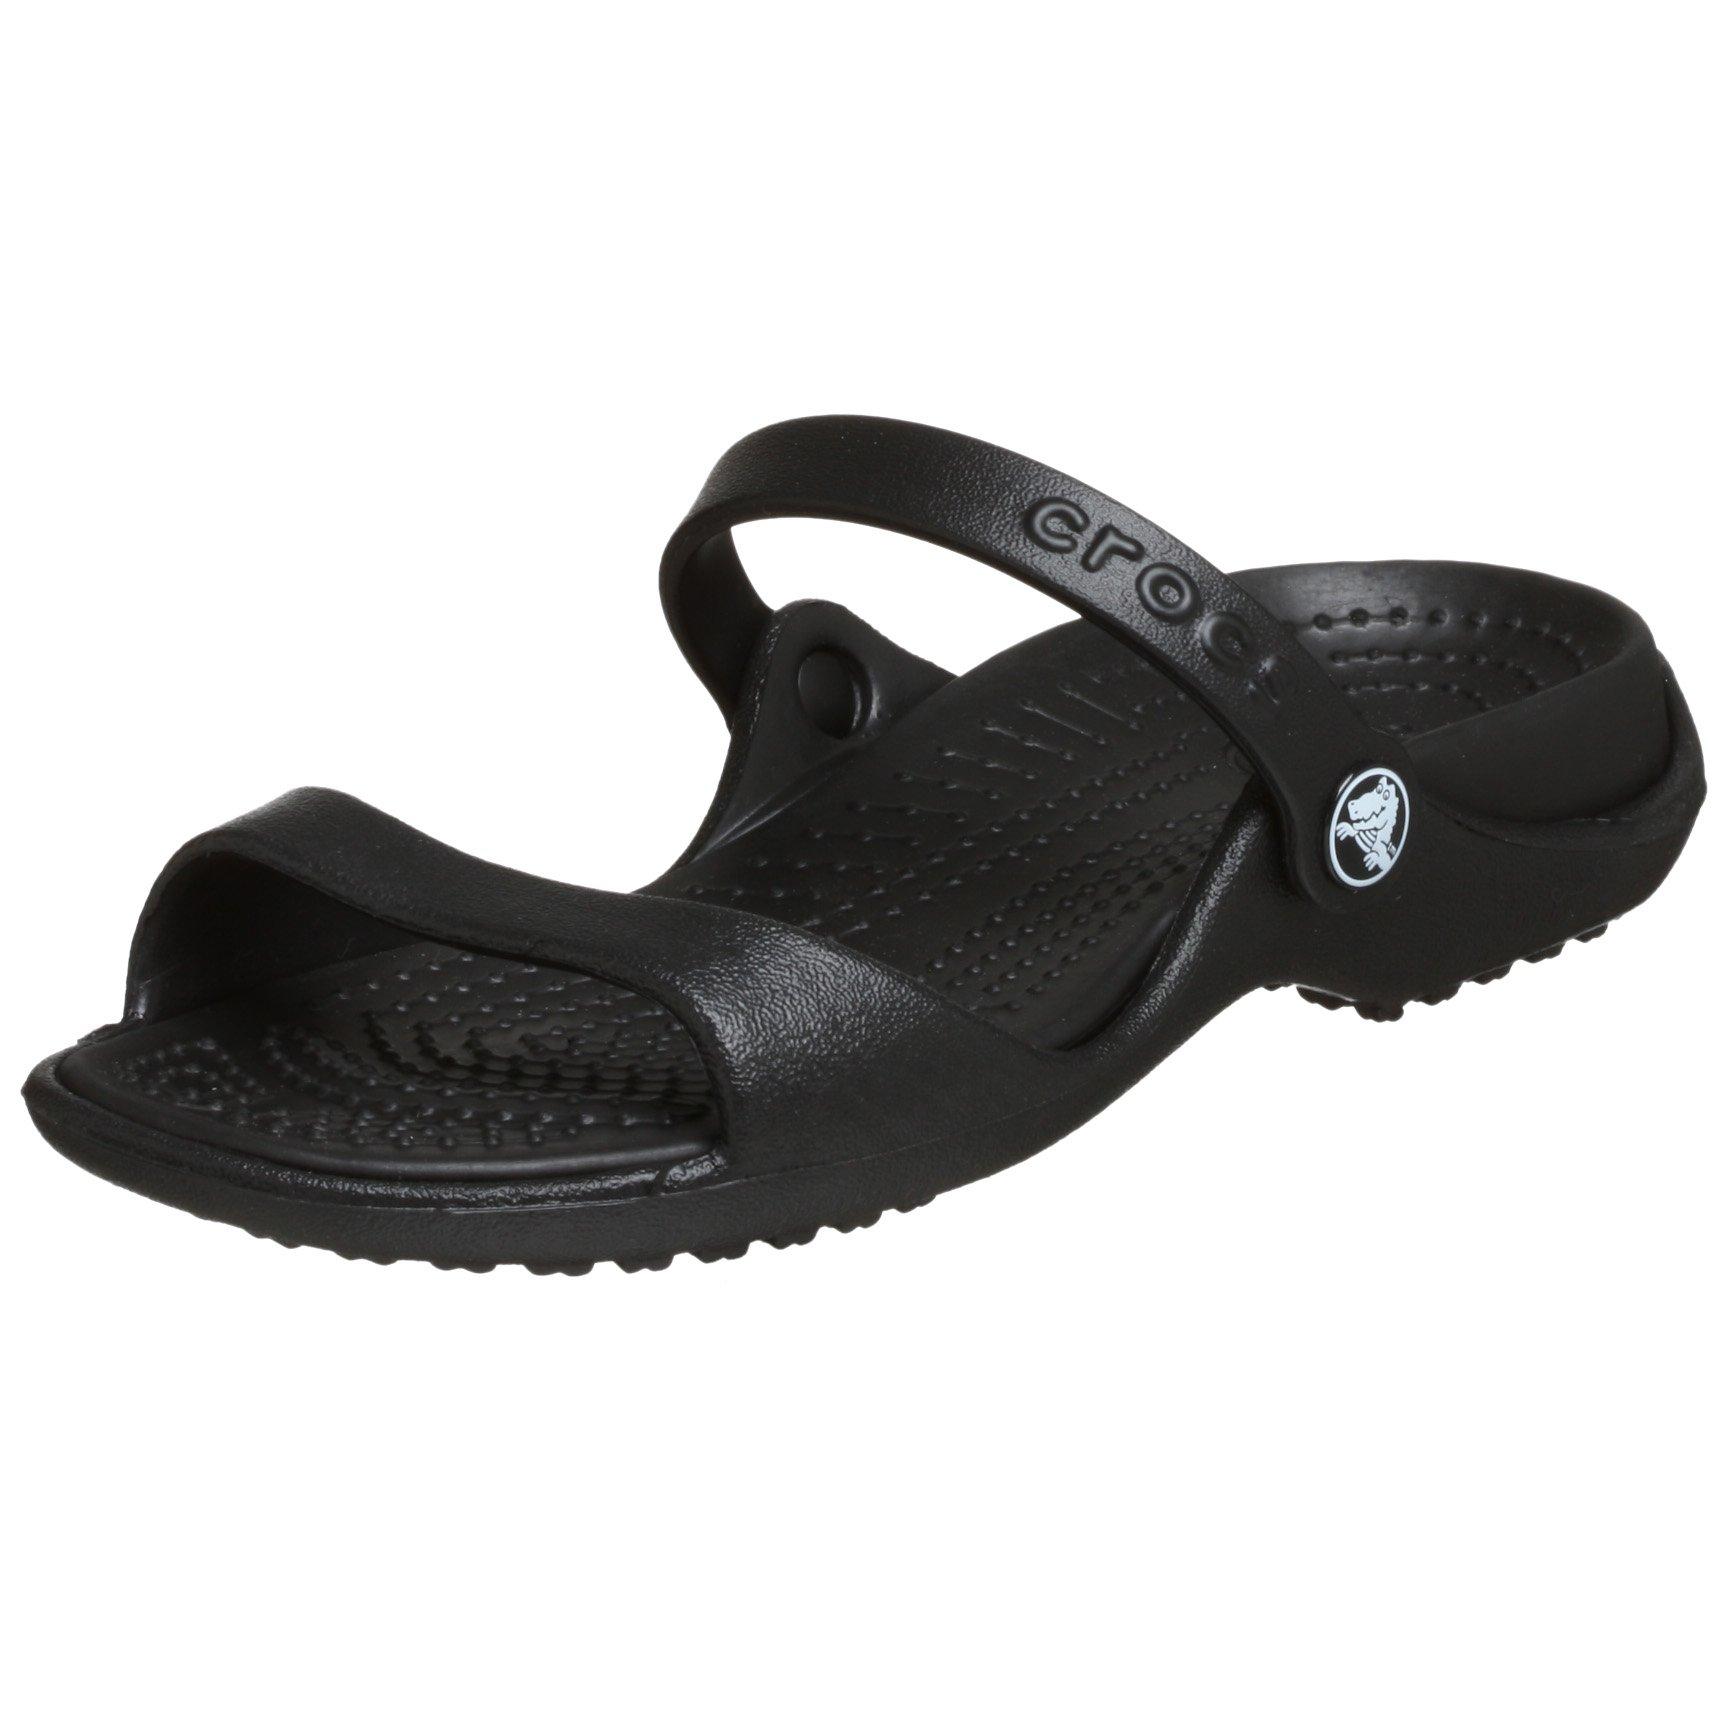 Crocs Women's Cleo Black/Black Croslite Sandals - 8 B(M) US by Crocs